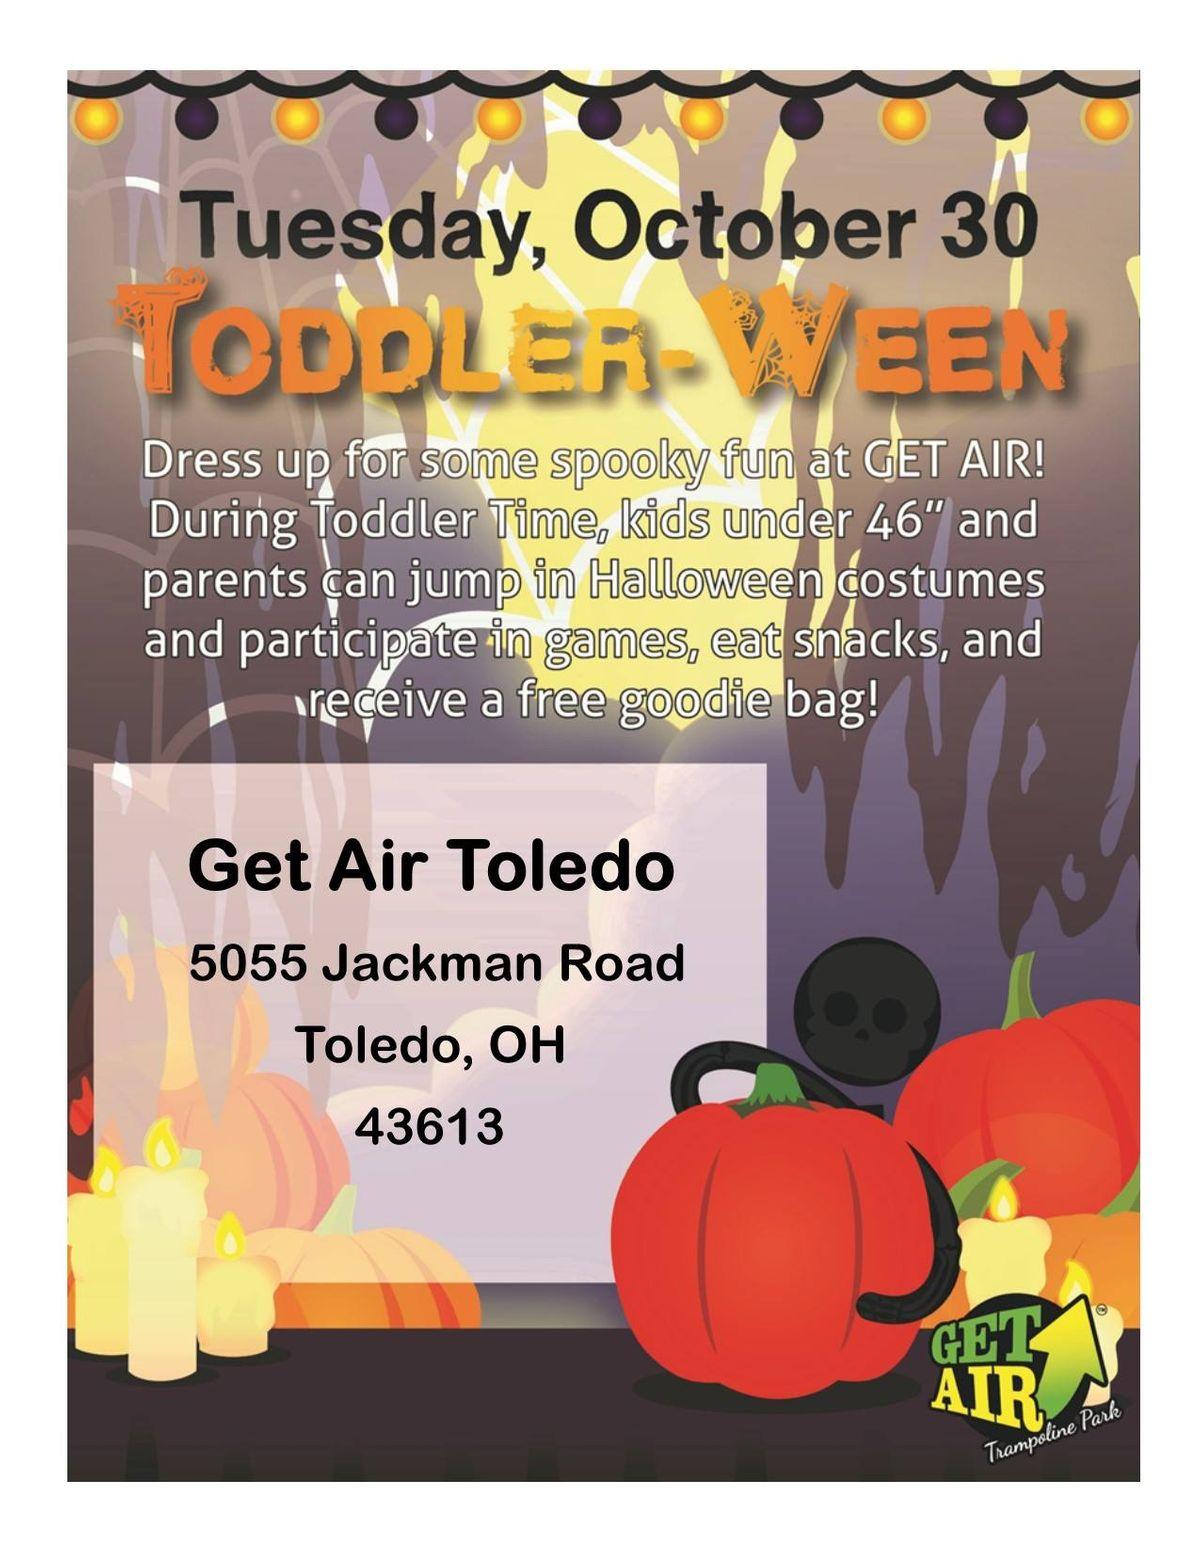 toddler-ween at get air toledo | ohio